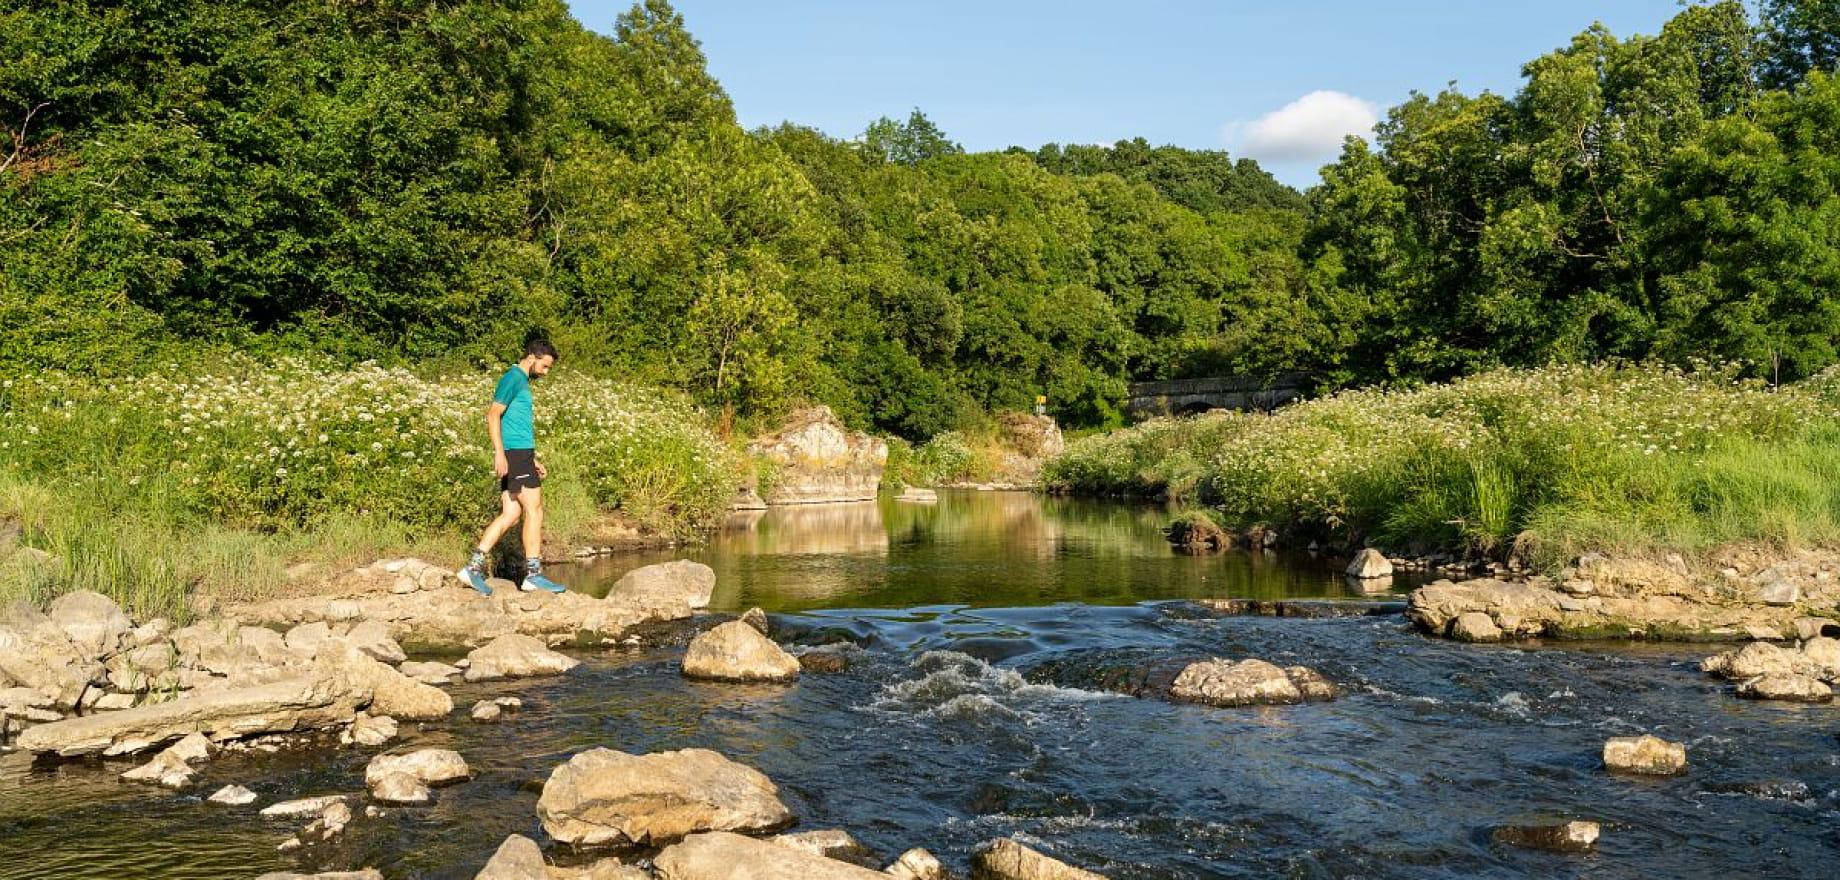 Portrait - Cours d'eau - Running - footing - Course a pied - Trail